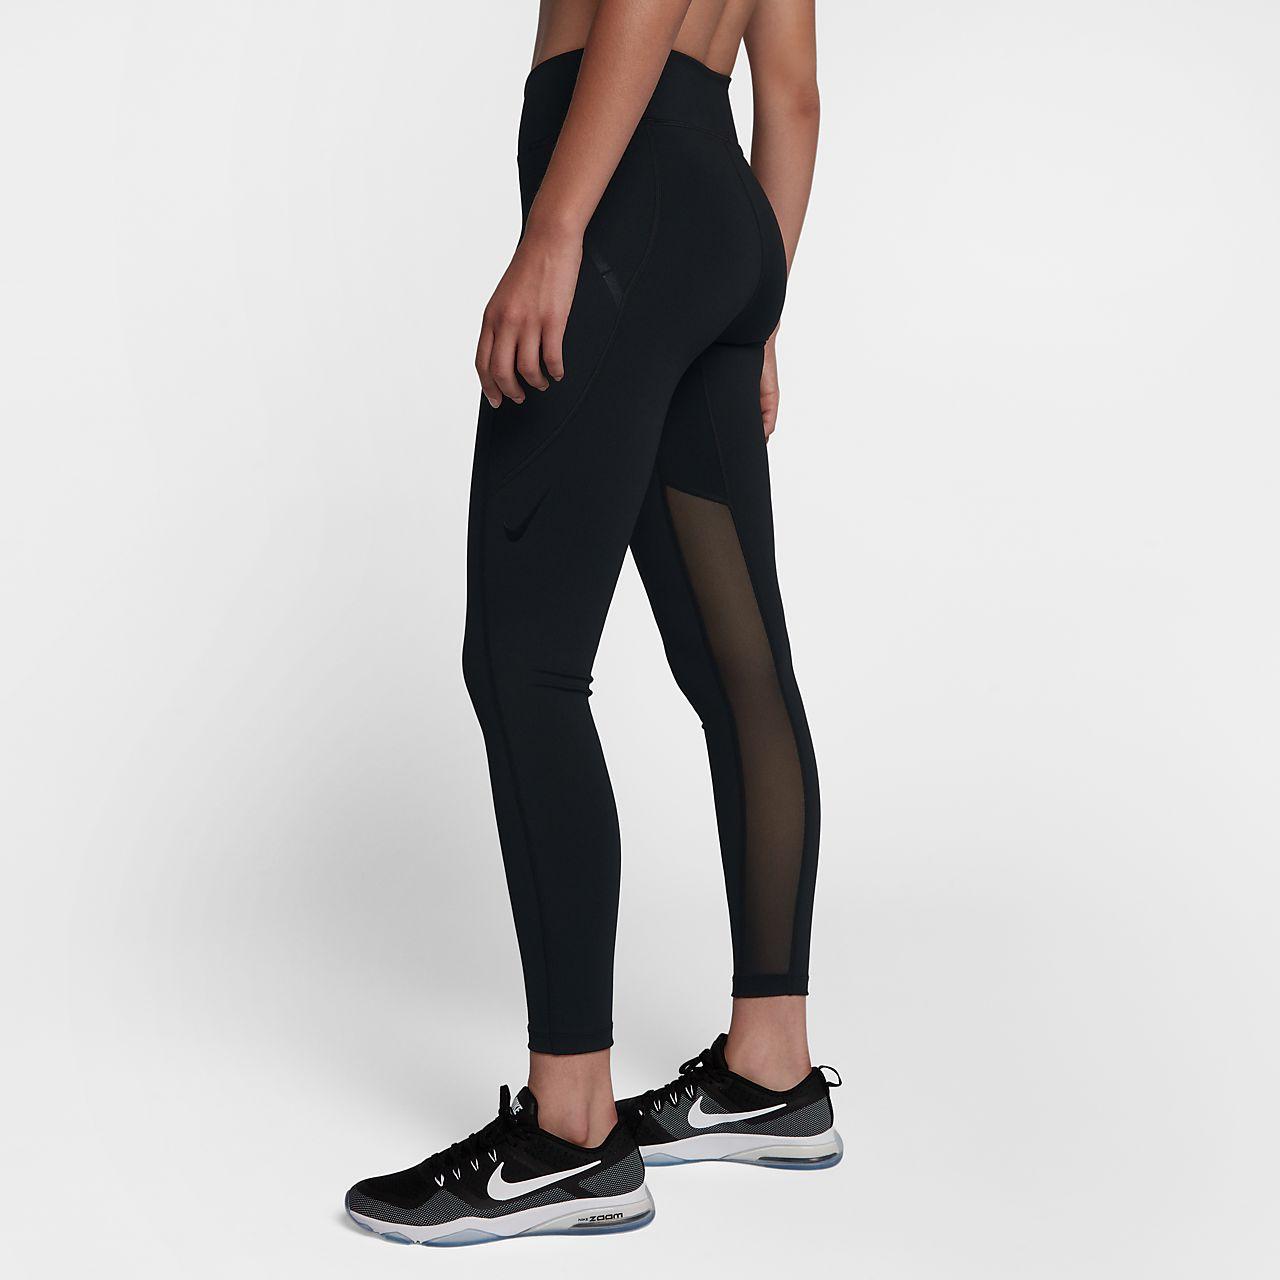 A Training Power Lux Donna Pocket Da Nike Tights Alta Vita qC4SawcE6